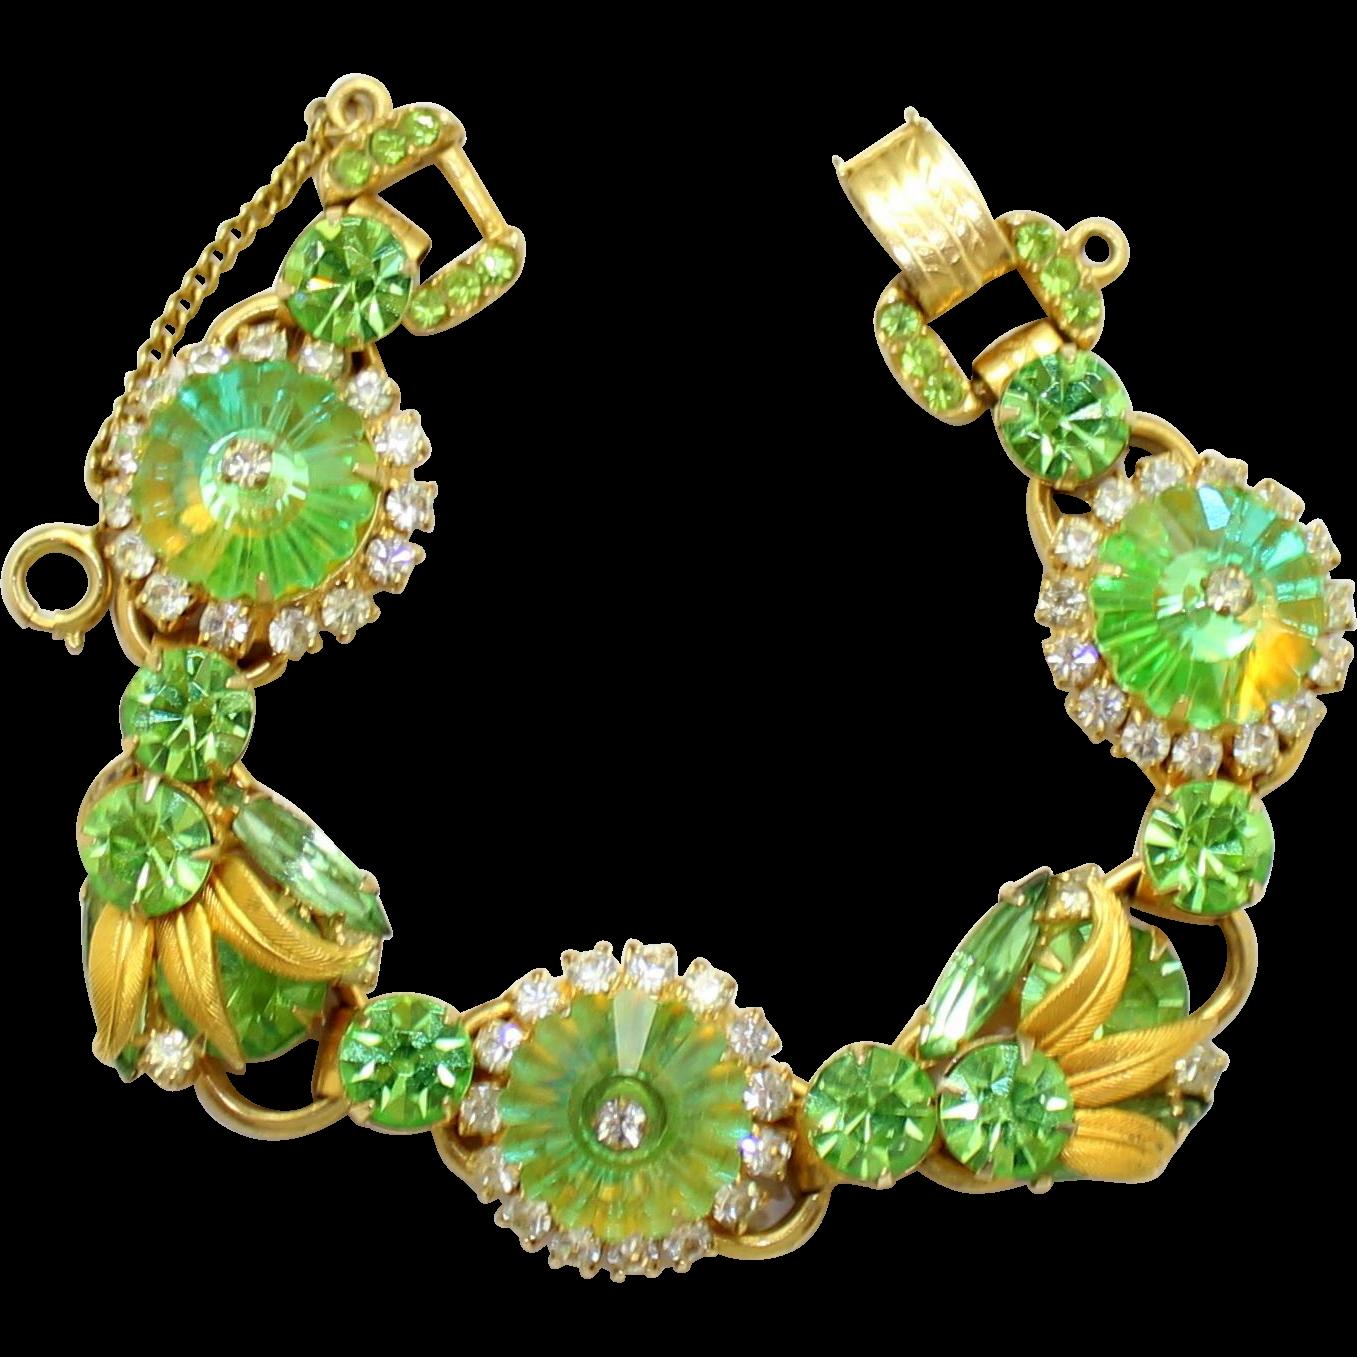 Vintage Juliana (D&E) Book Piece Venus Flames Peridot Green Margarita Rhinestone Bracelet